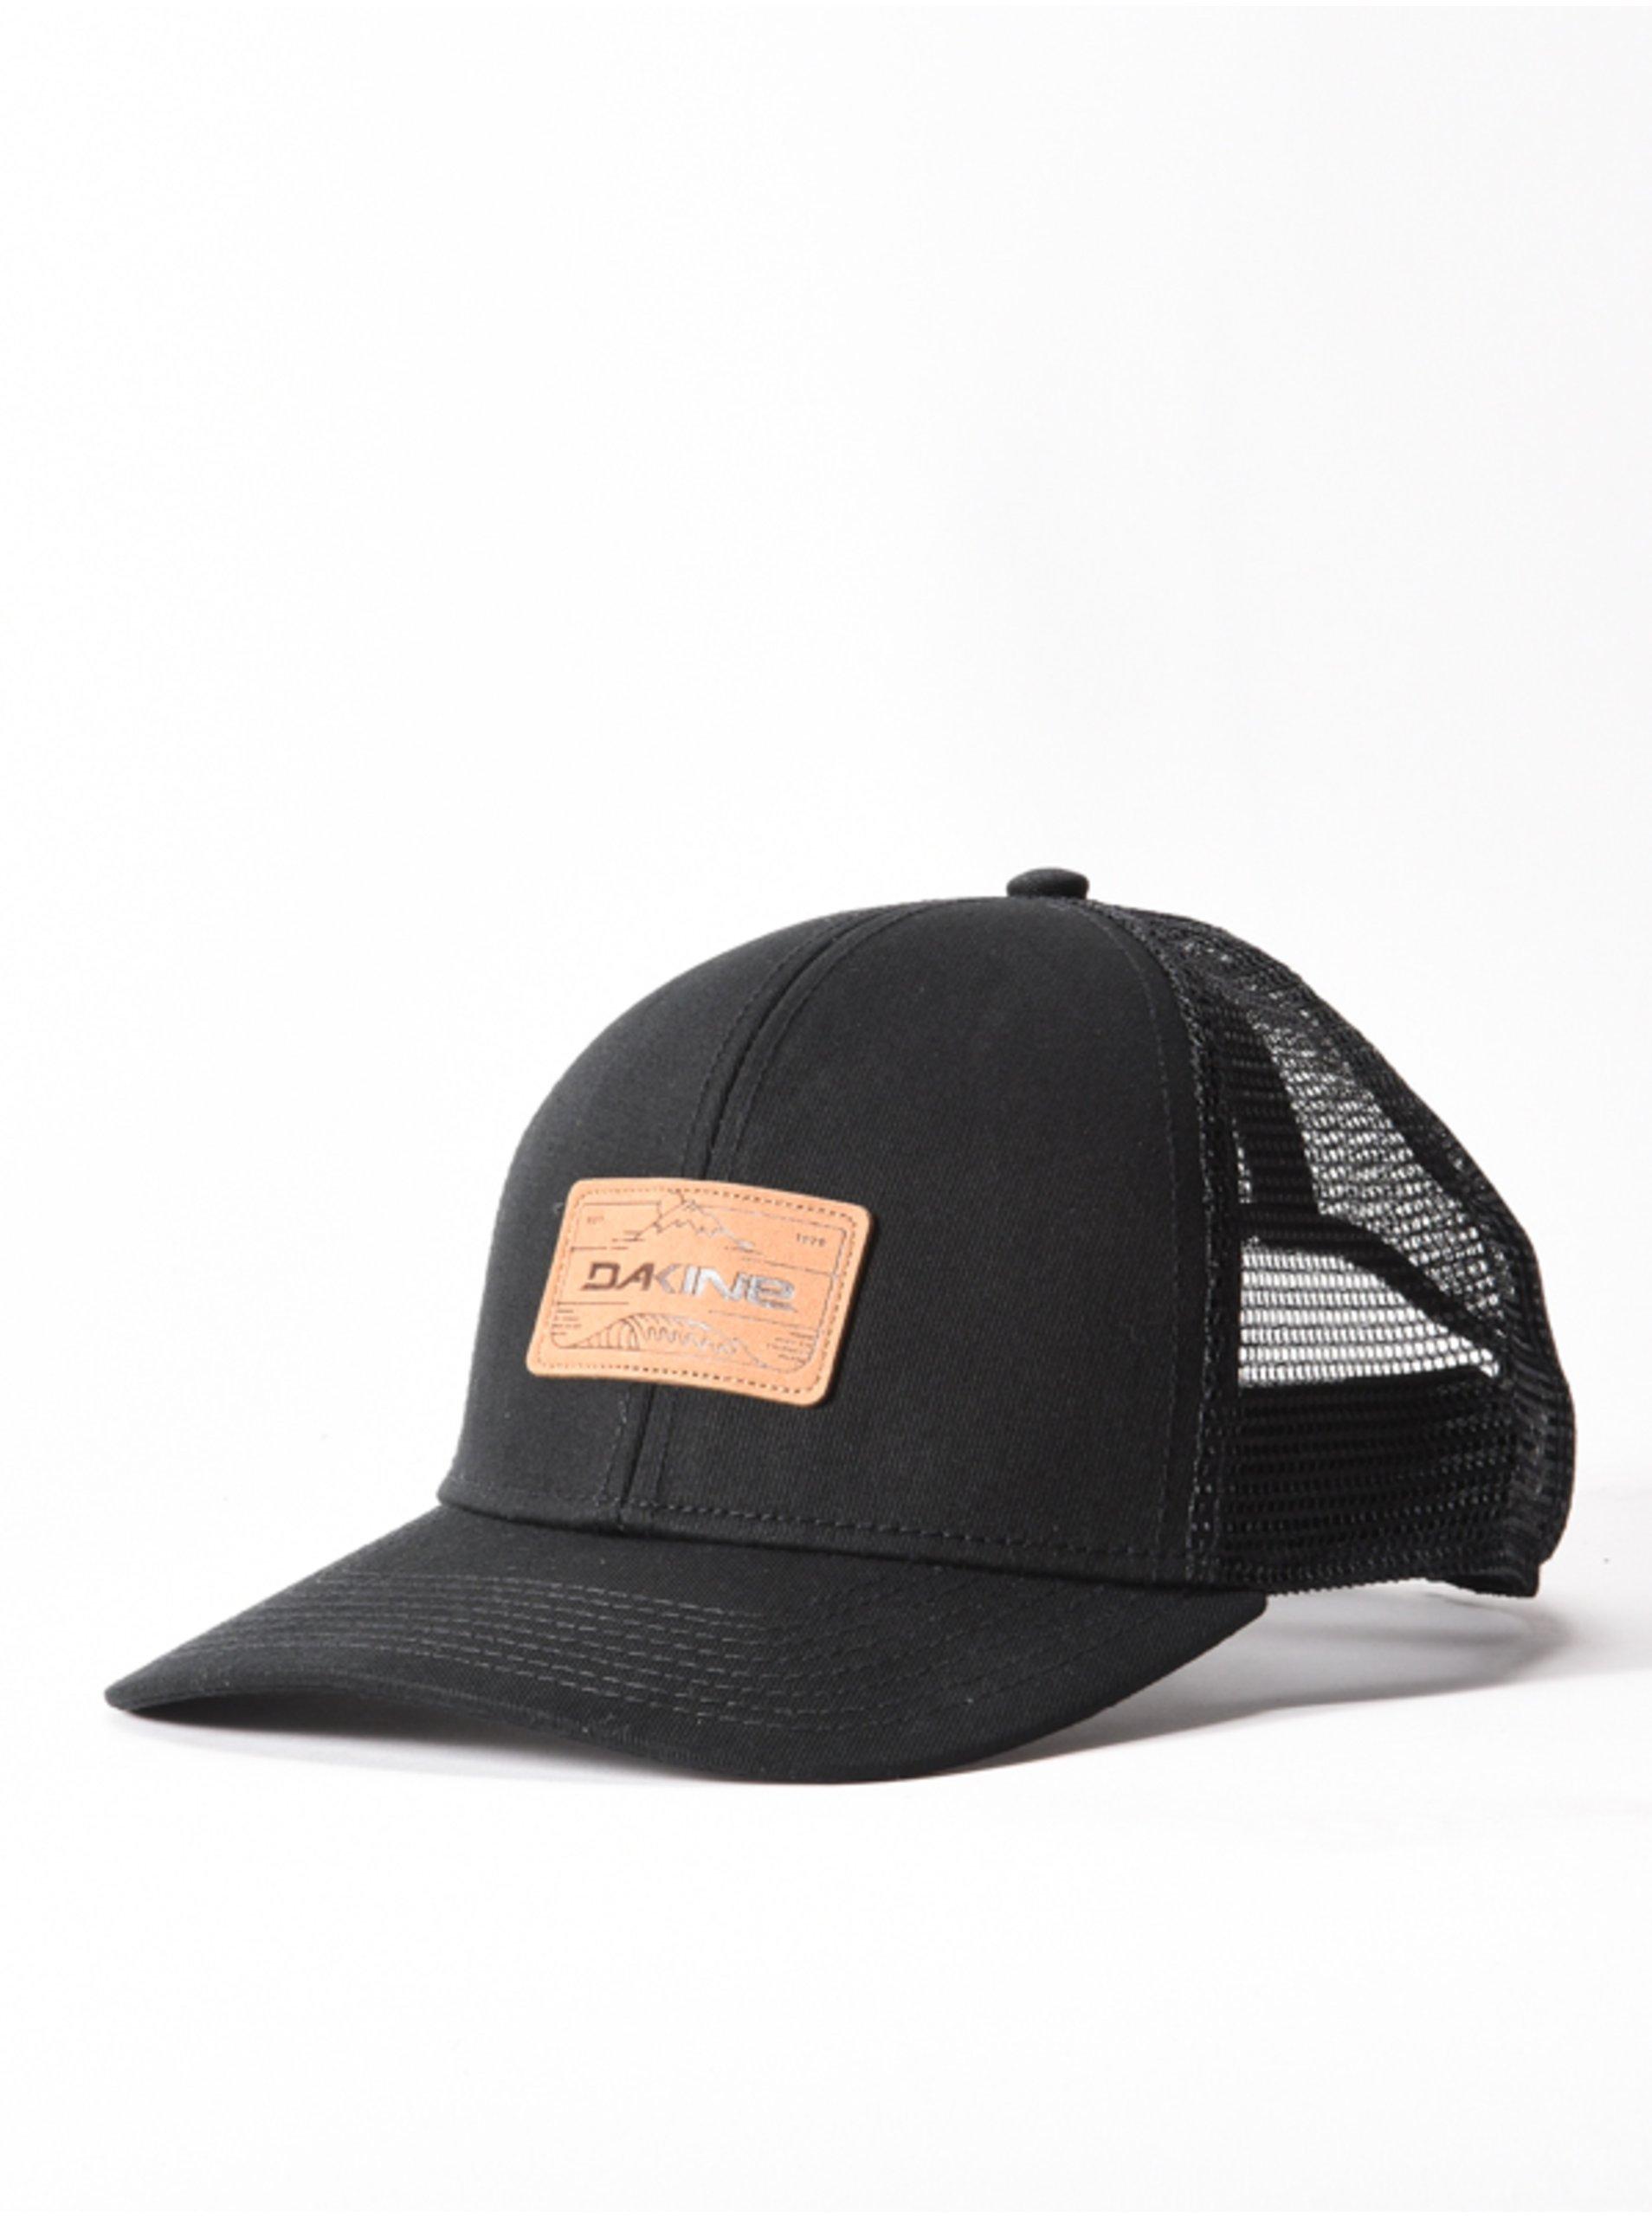 Dakine PEAK TO PEAK black baseballová kšiltovka - černá